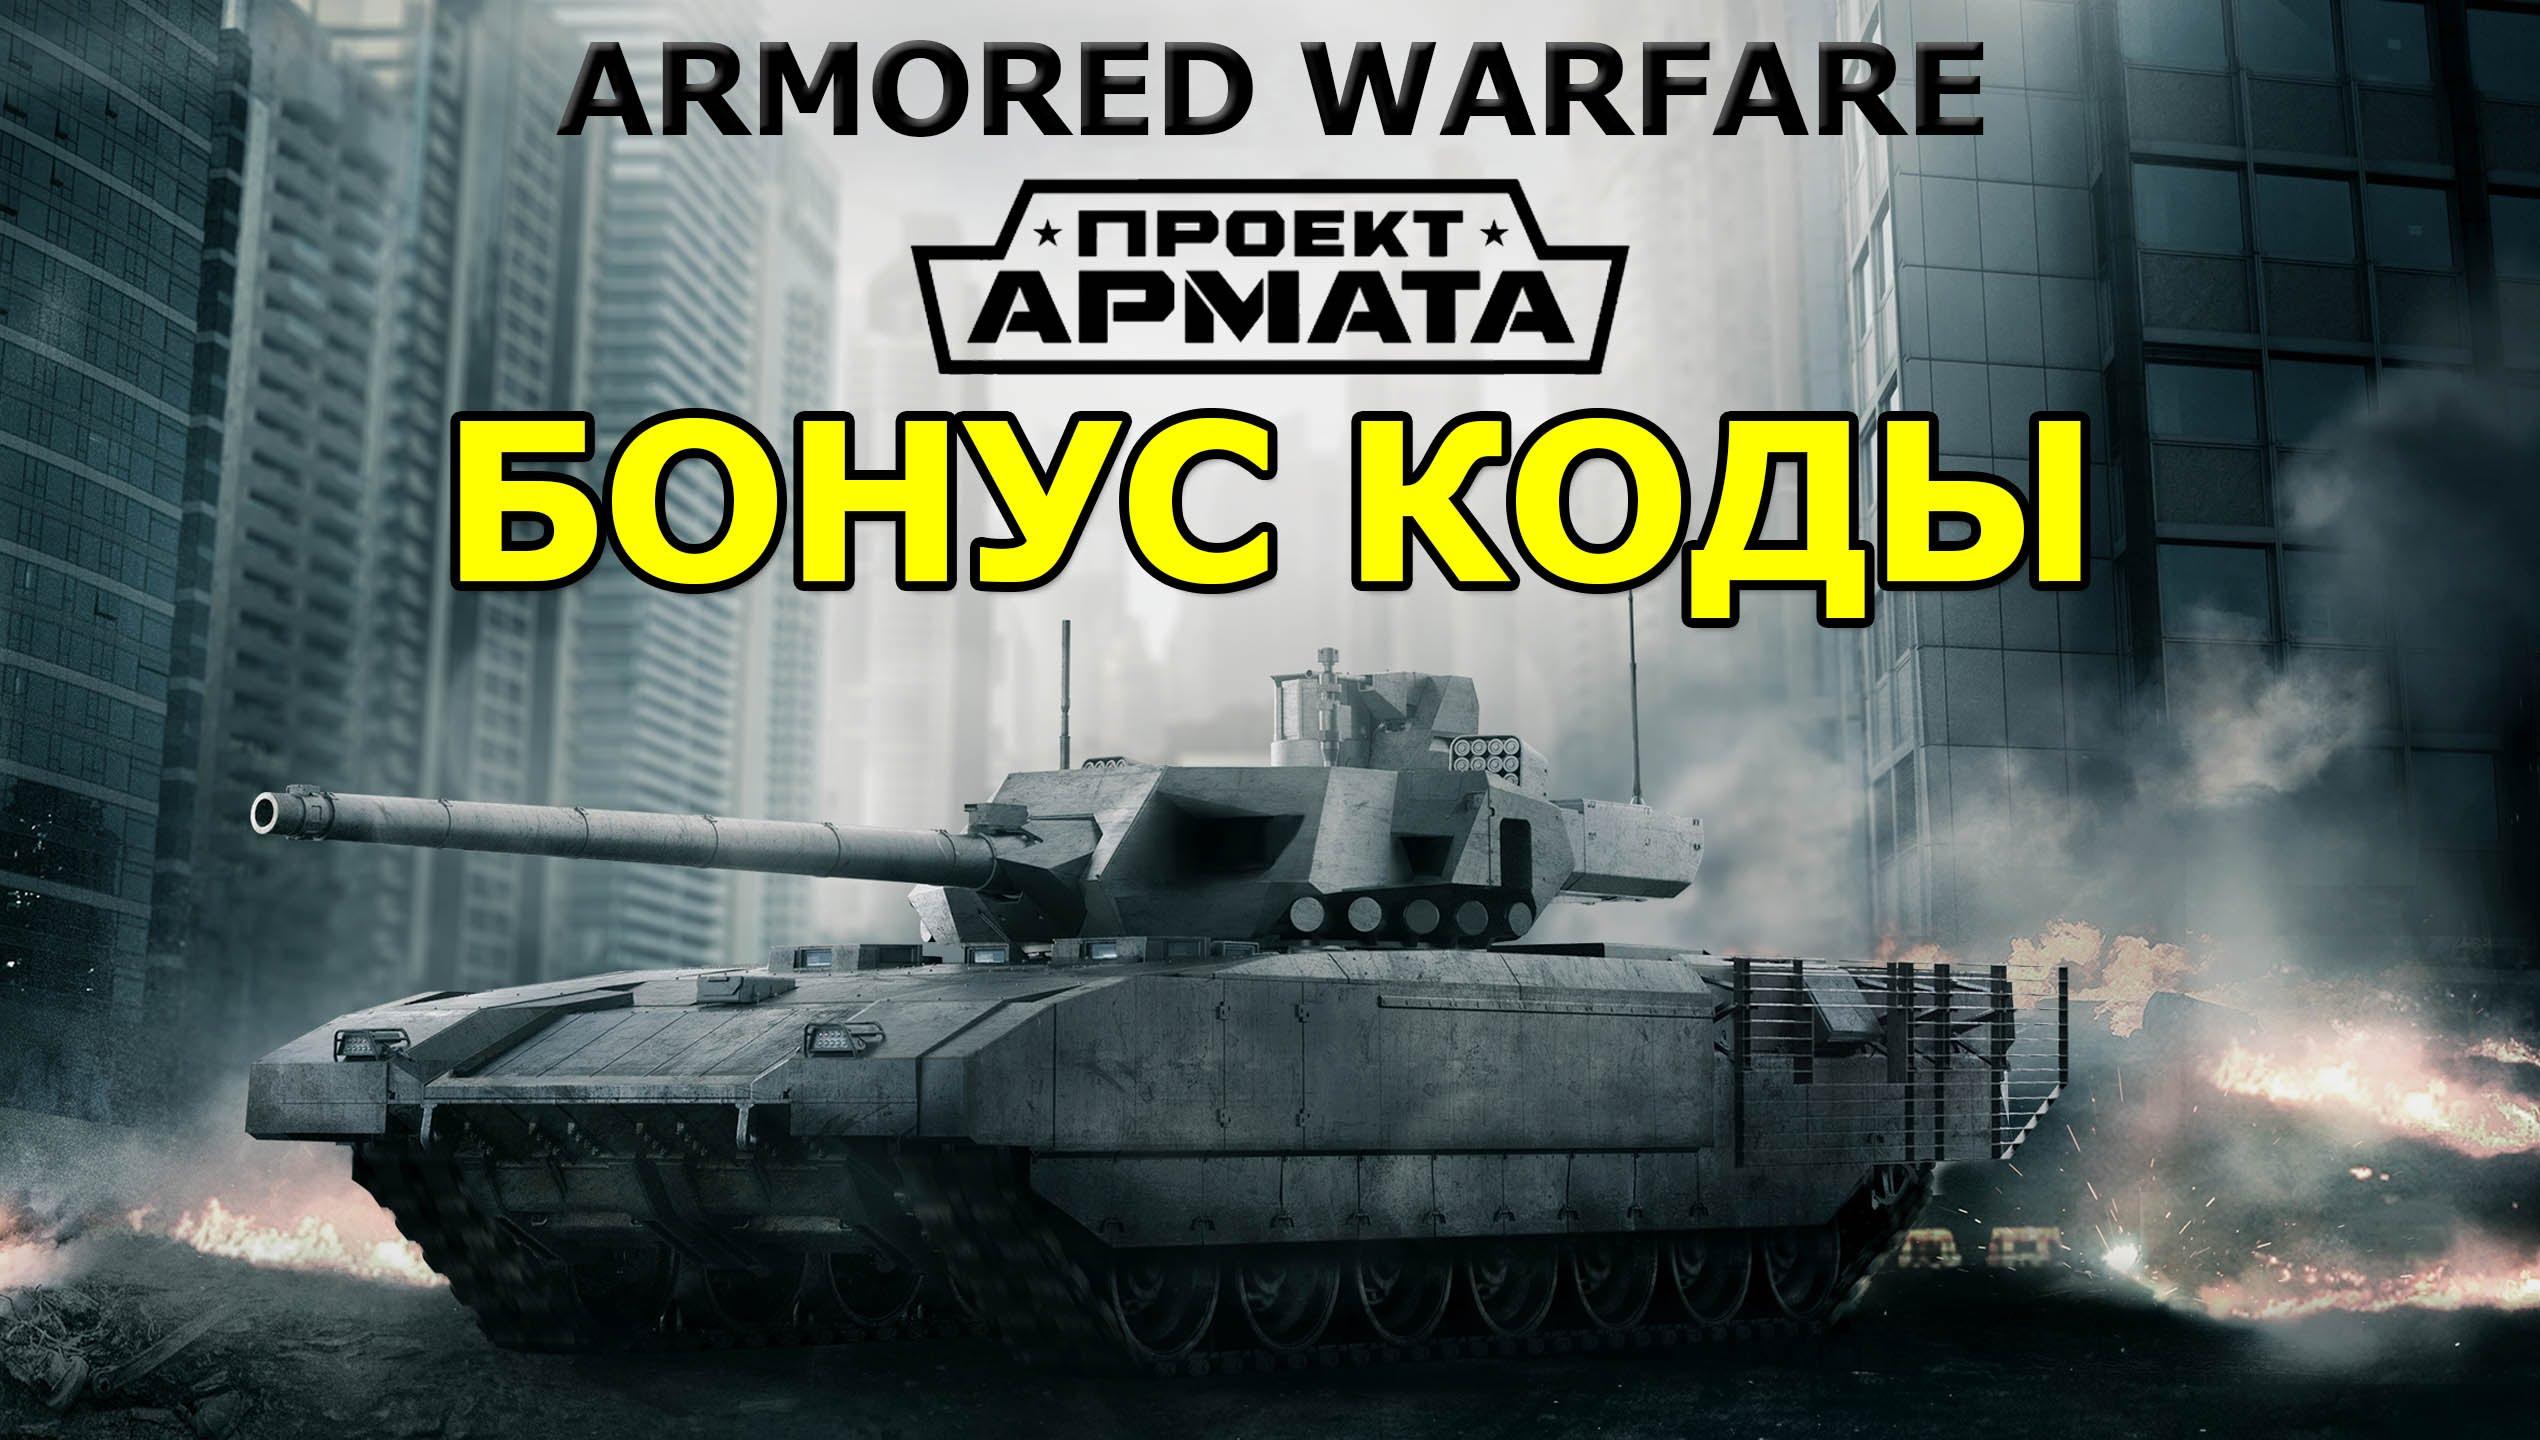 бонус код для world of tanks на танк type 59